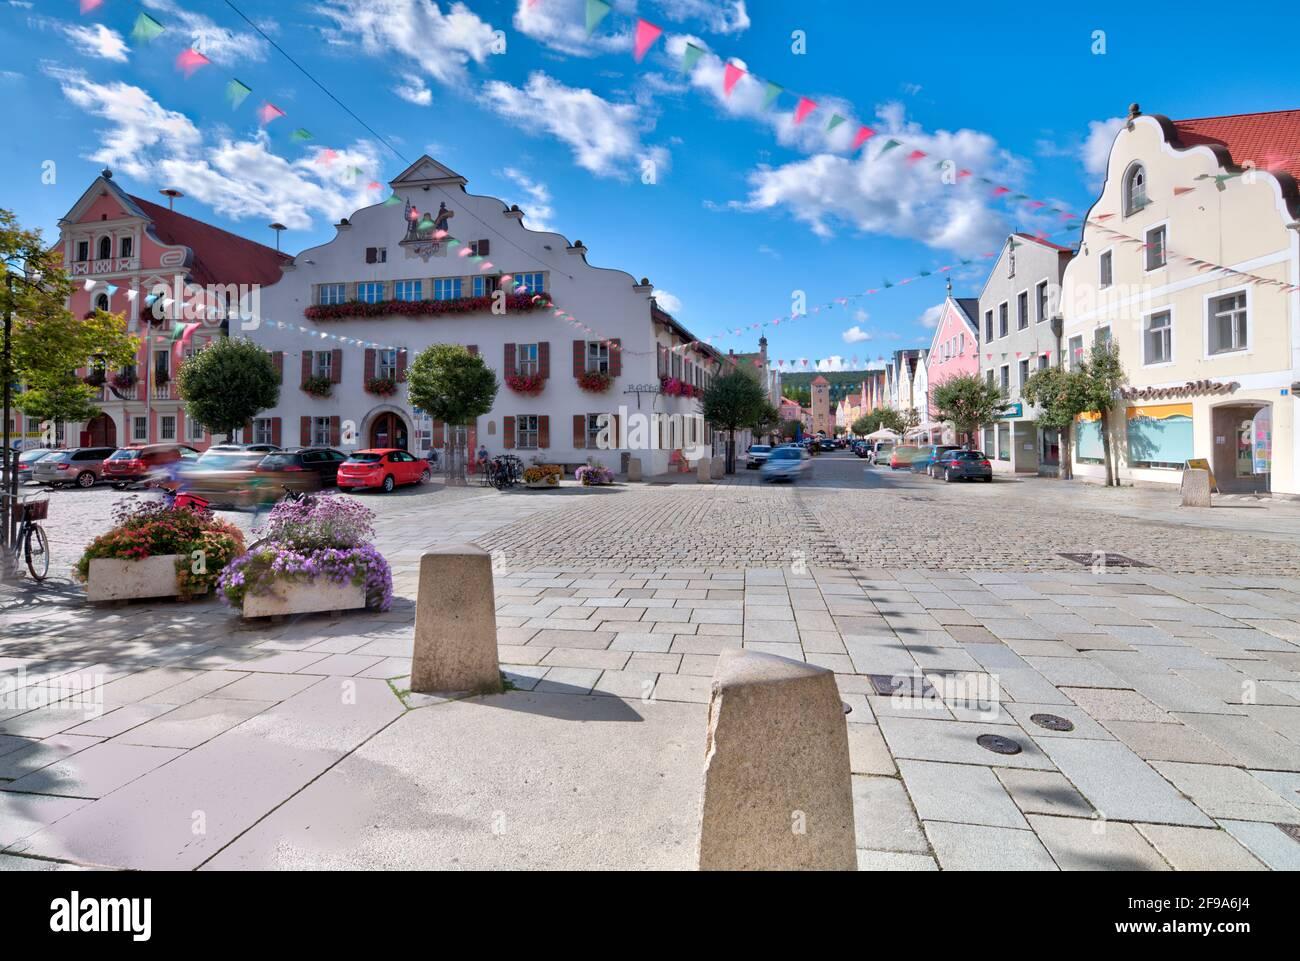 Ludwigsplatz, town hall, Danube tower, house facade, old, historical, architecture, Kelheim, Bavaria, Germany, Europe Stock Photo